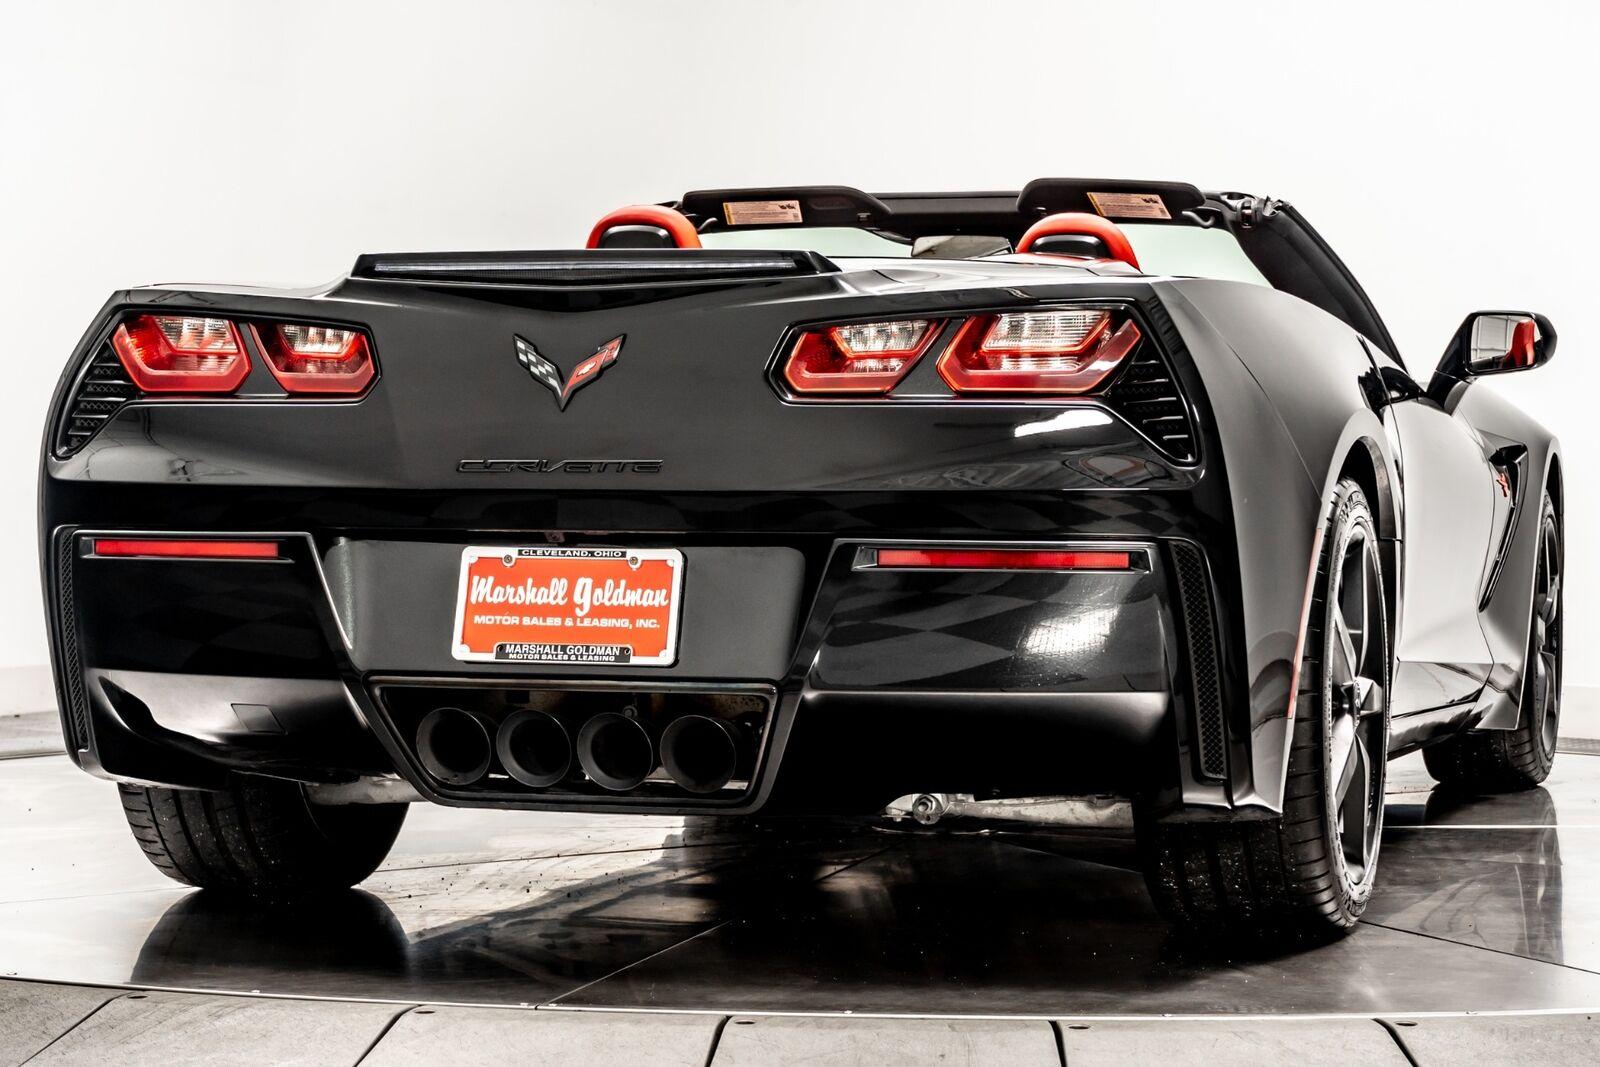 2014 Black Chevrolet Corvette Convertible 2LT   C7 Corvette Photo 8